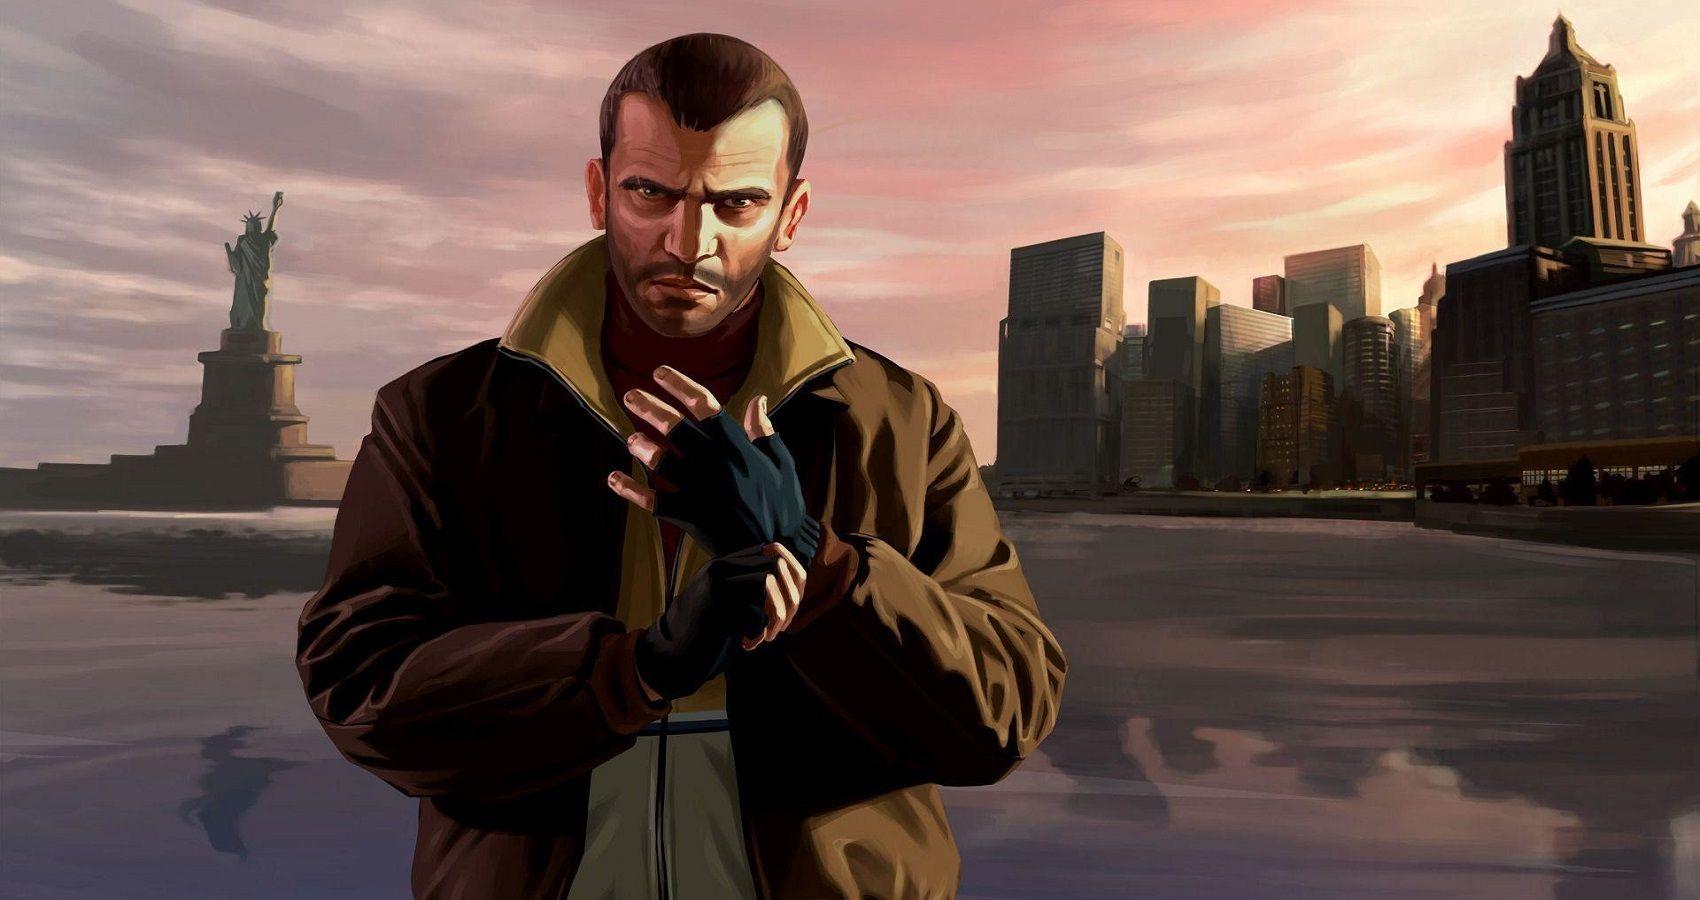 Distante Receptor Decir a un lado  Grand Theft Auto IV: 10 Storylines That Were Never Resolved